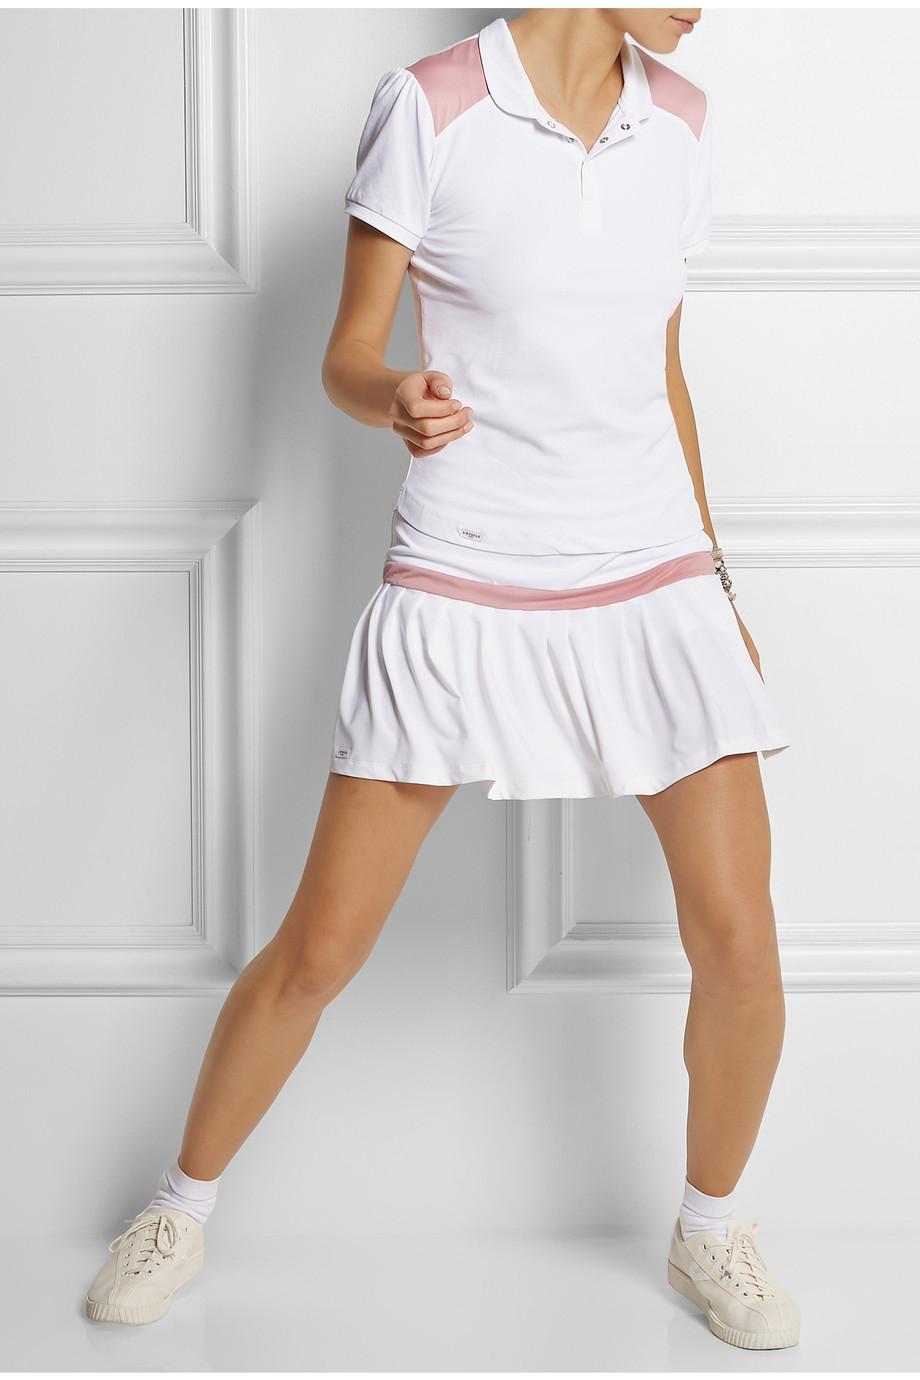 Falke Womens Tennis Short Maximum Socks White